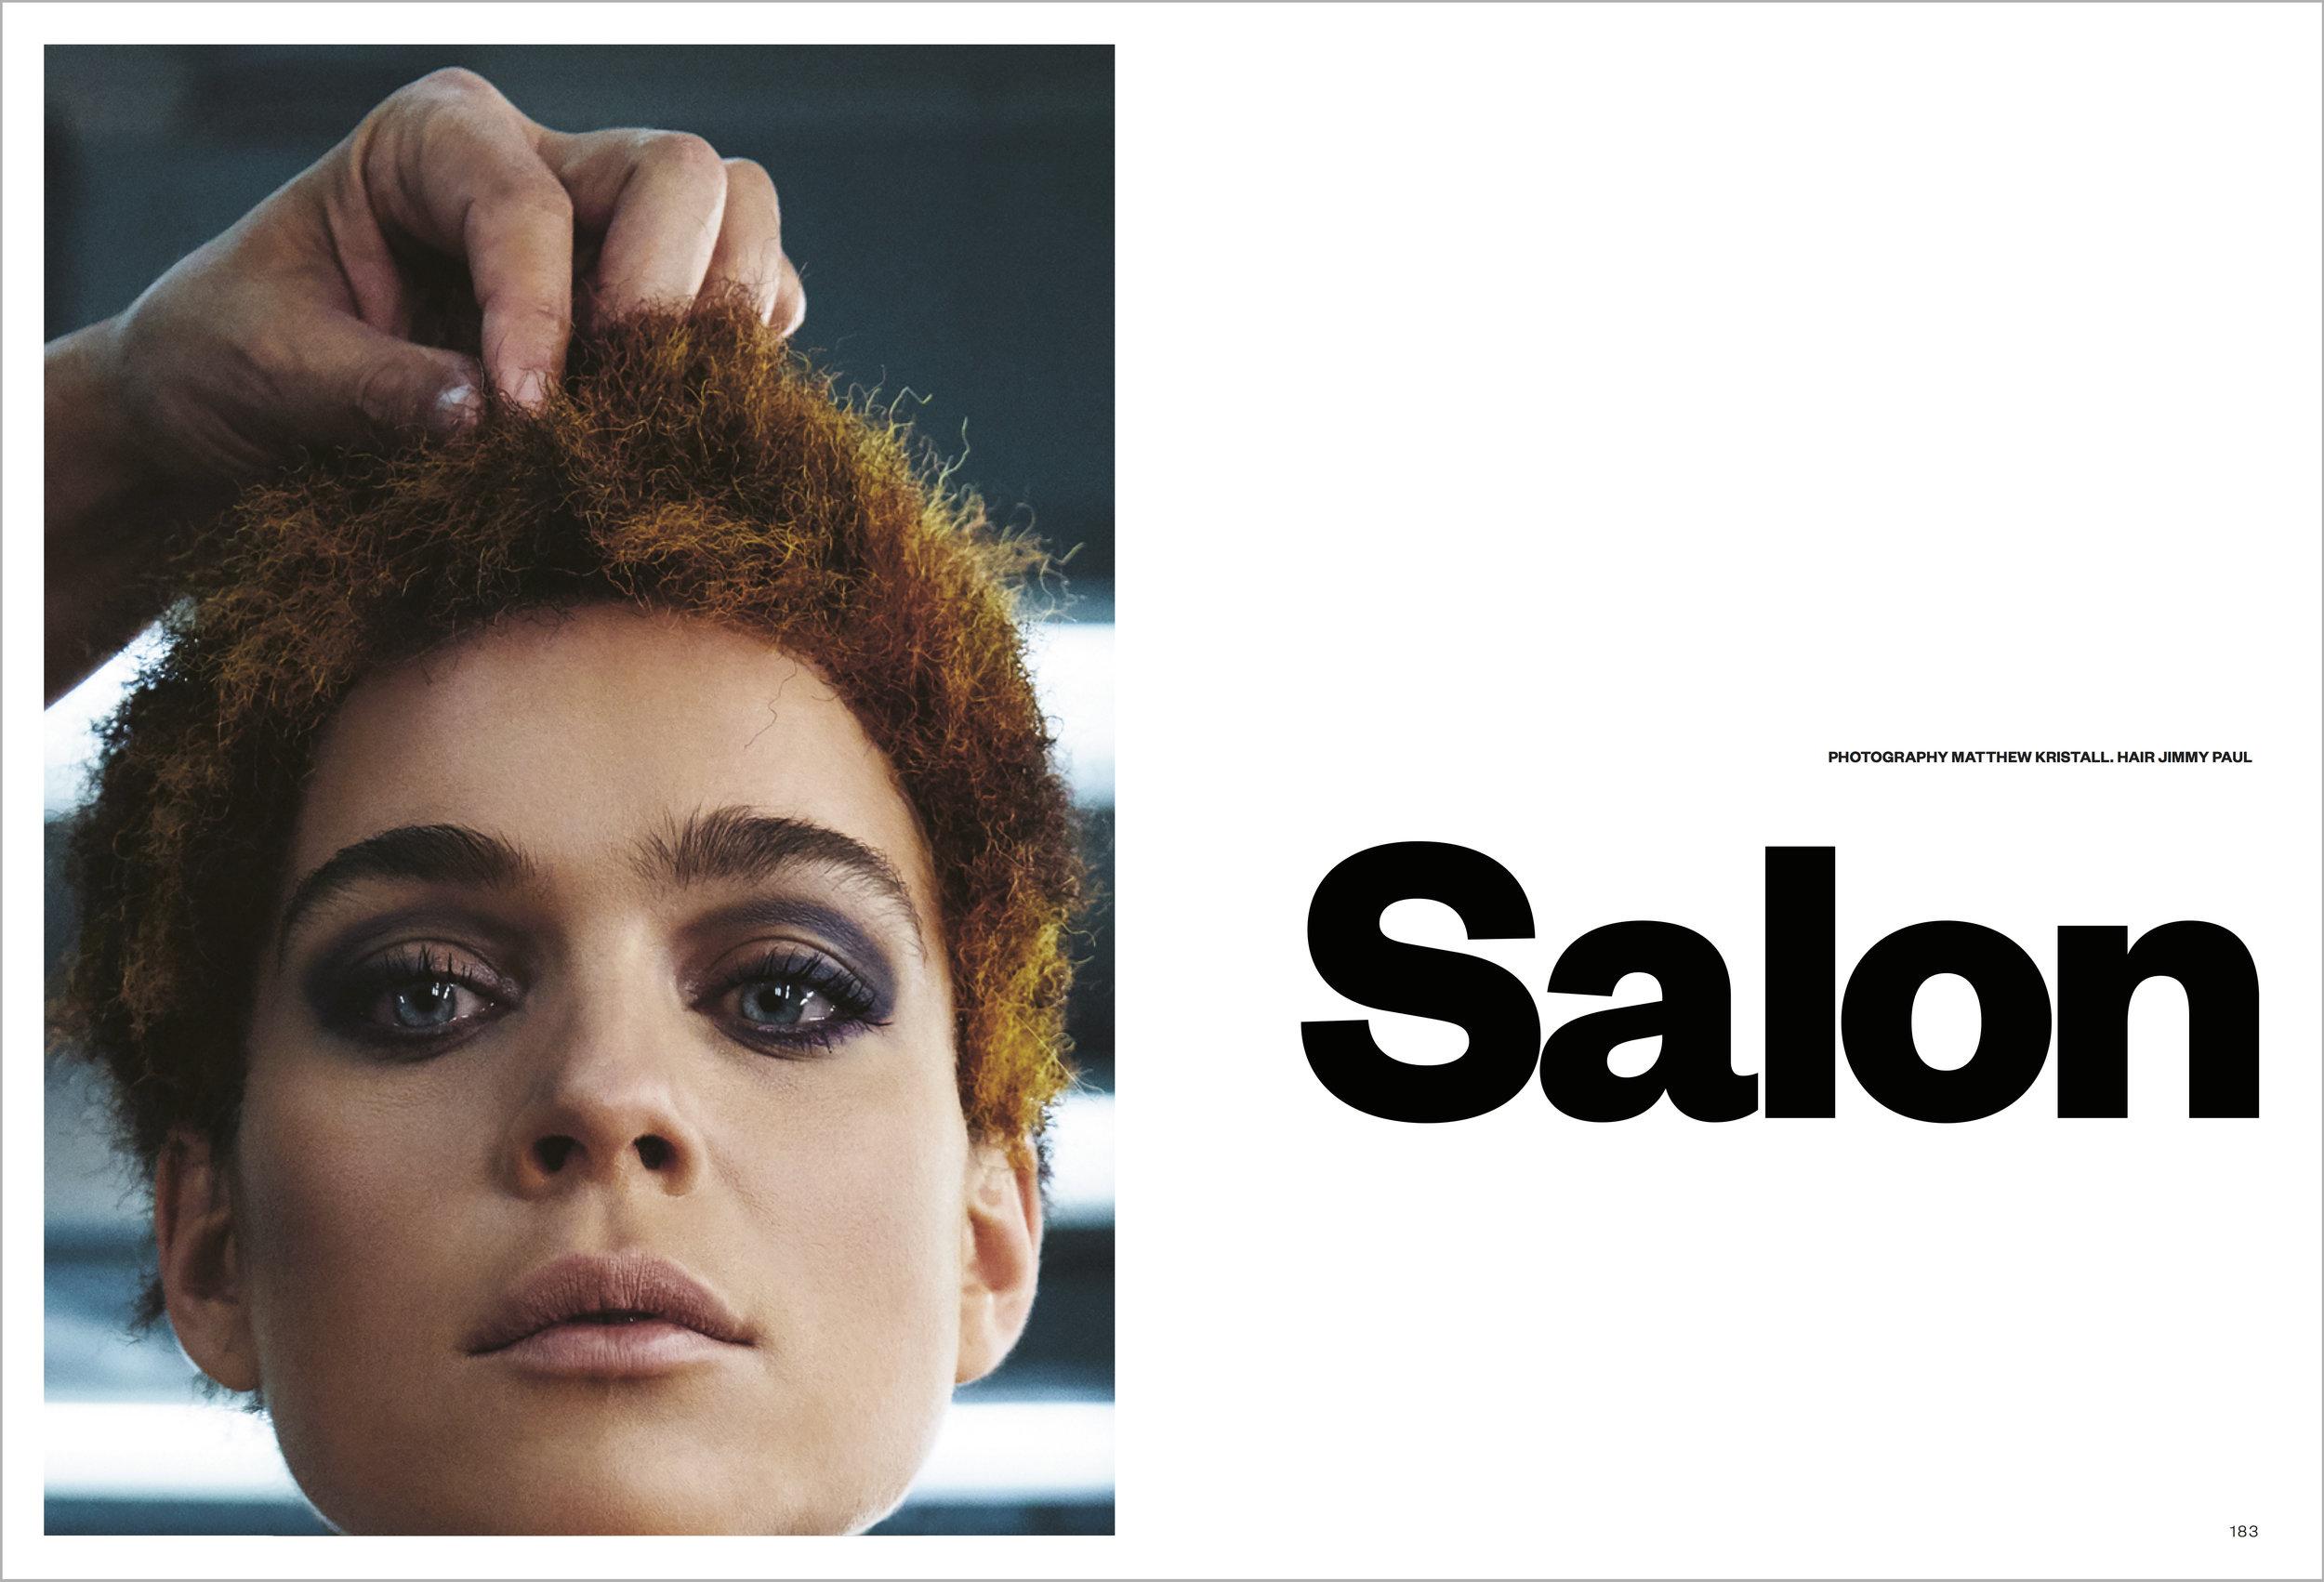 Beauty Papers - Salon